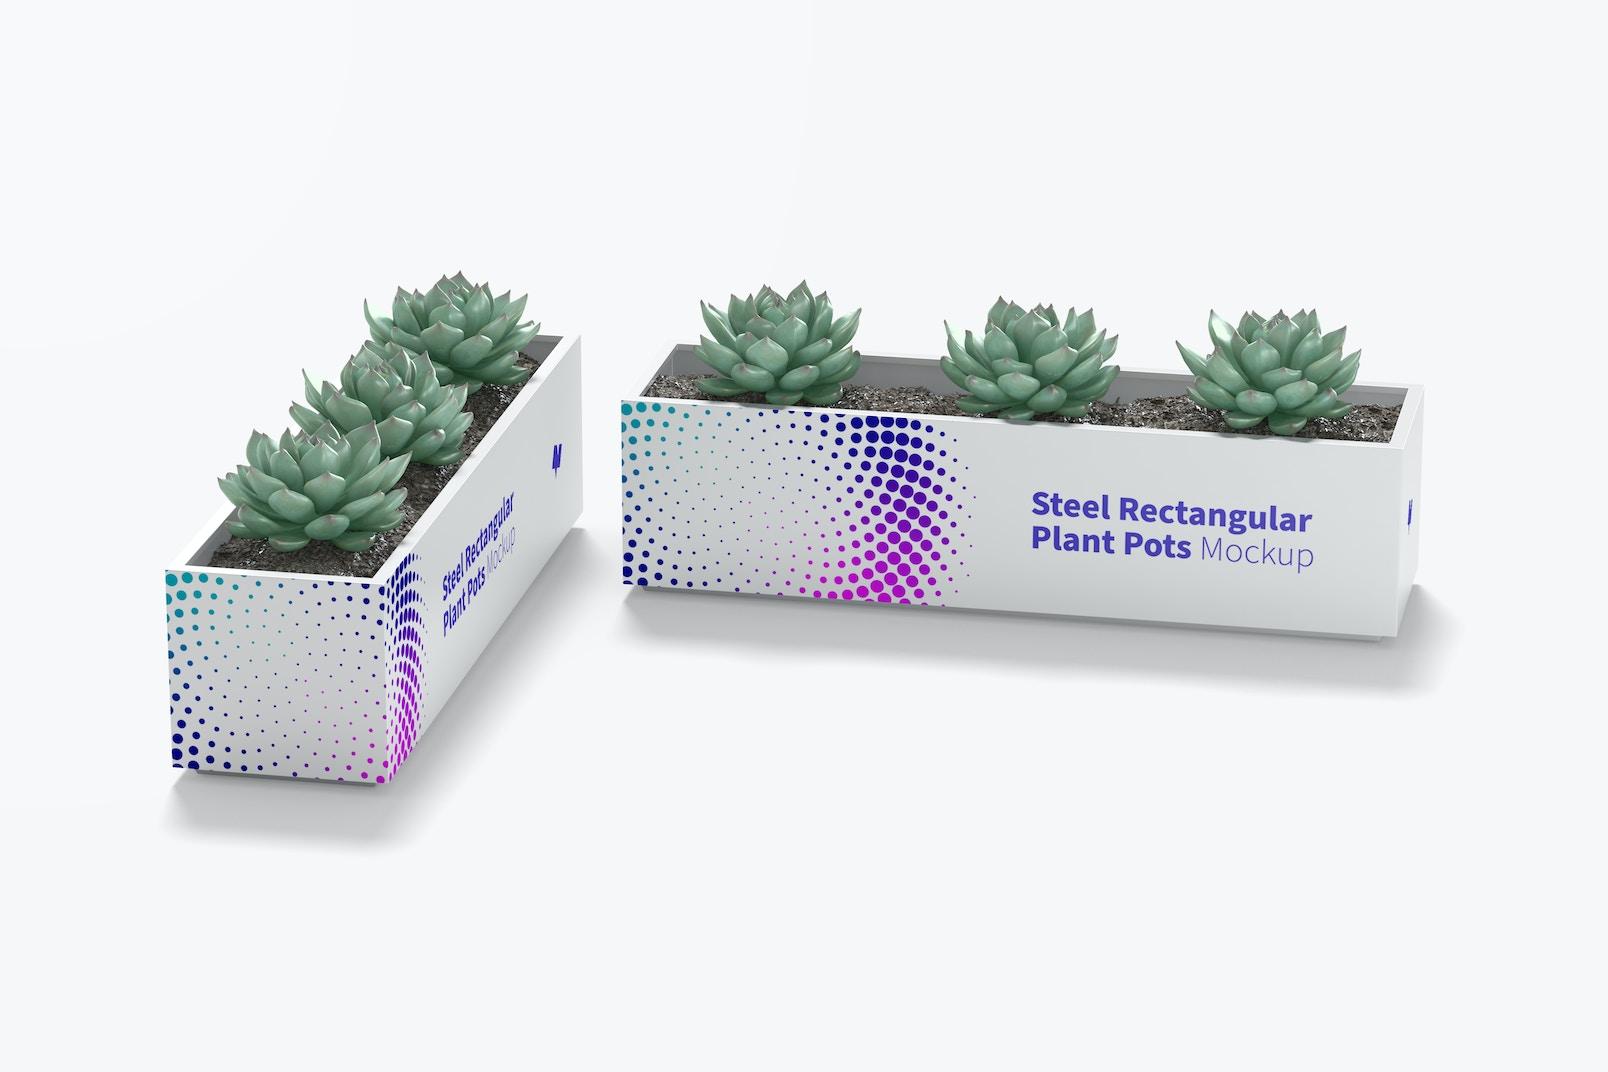 Steel Rectangular Plant Pots Mockup